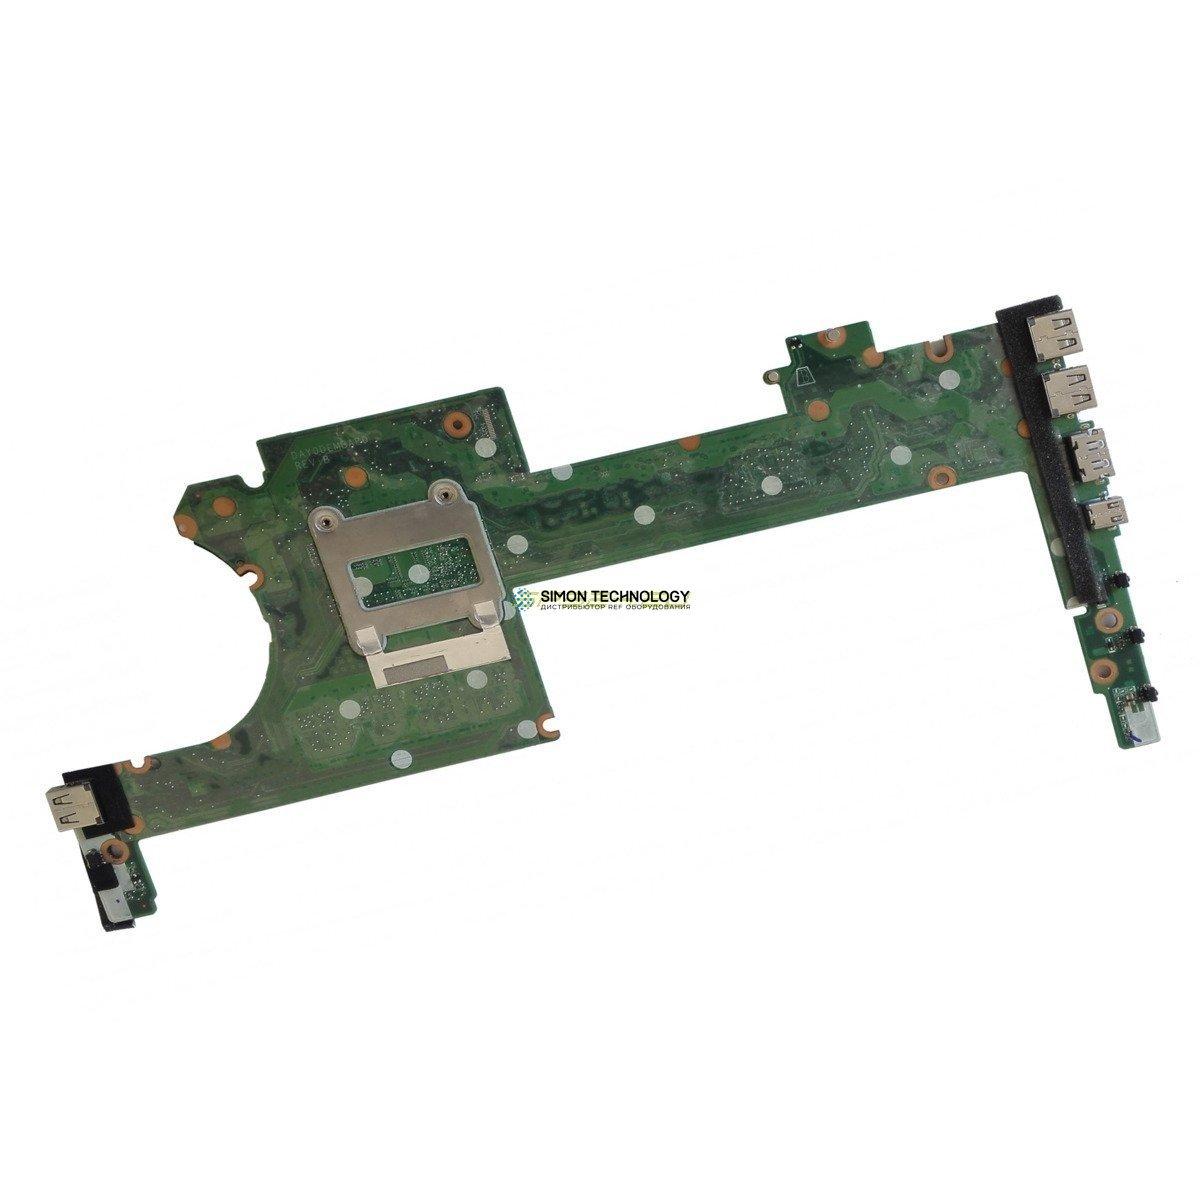 HPI MB UMA i5-6200U 8GB CR WIN (861991-601)